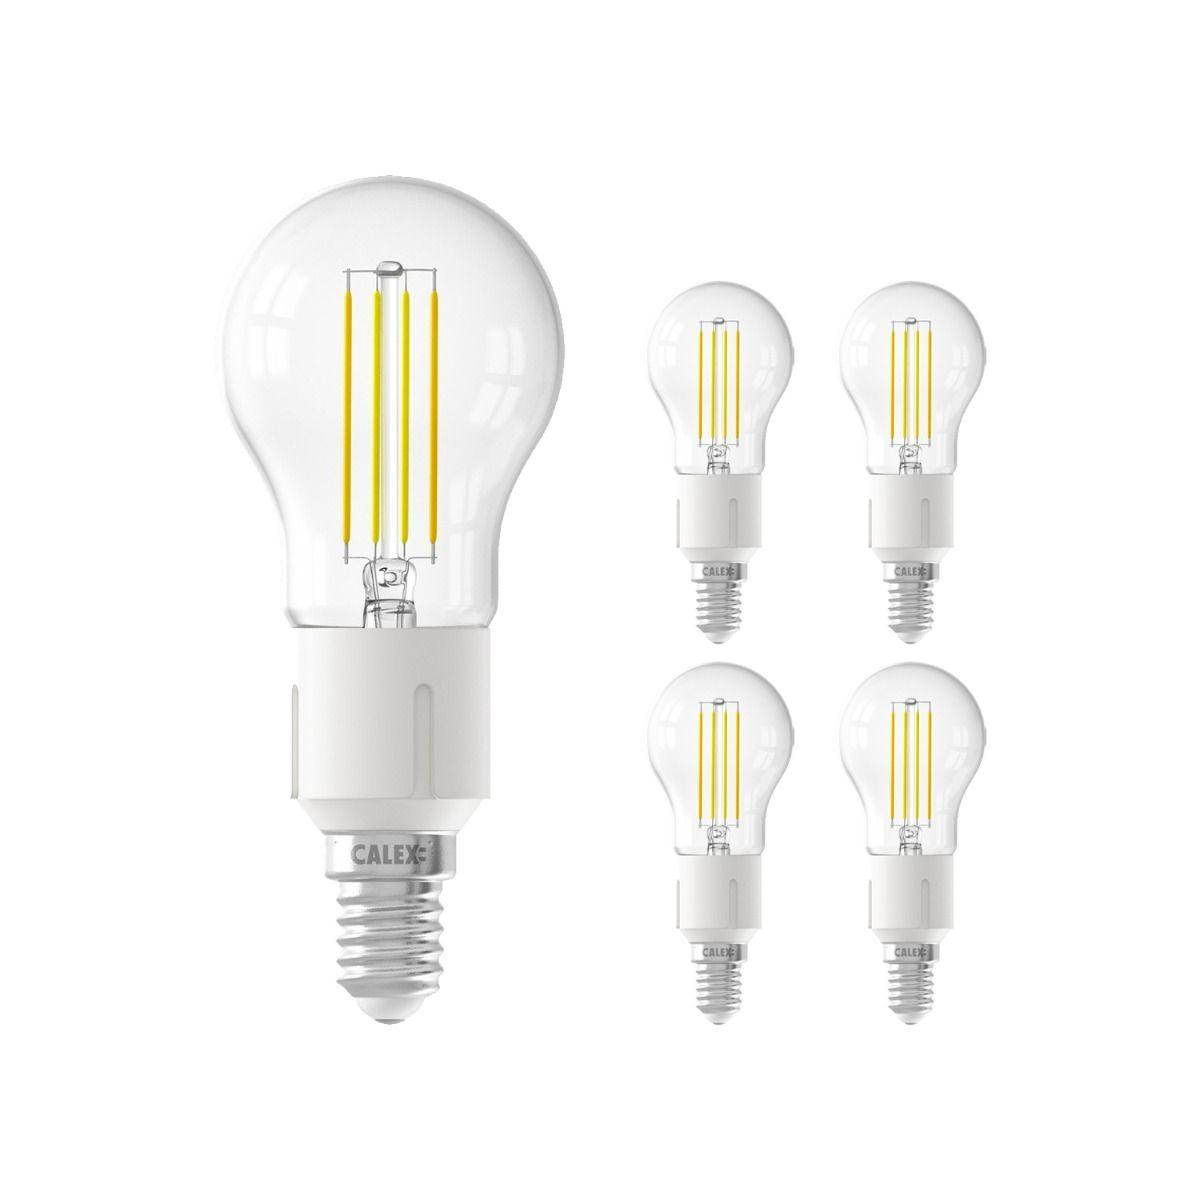 Voordeelpak 5x Calex Smart Kogelvormig LED Lamp E14 4,5W 450lm 1800-3000K Filament   Tuya Wifi - Afstembaar Wit